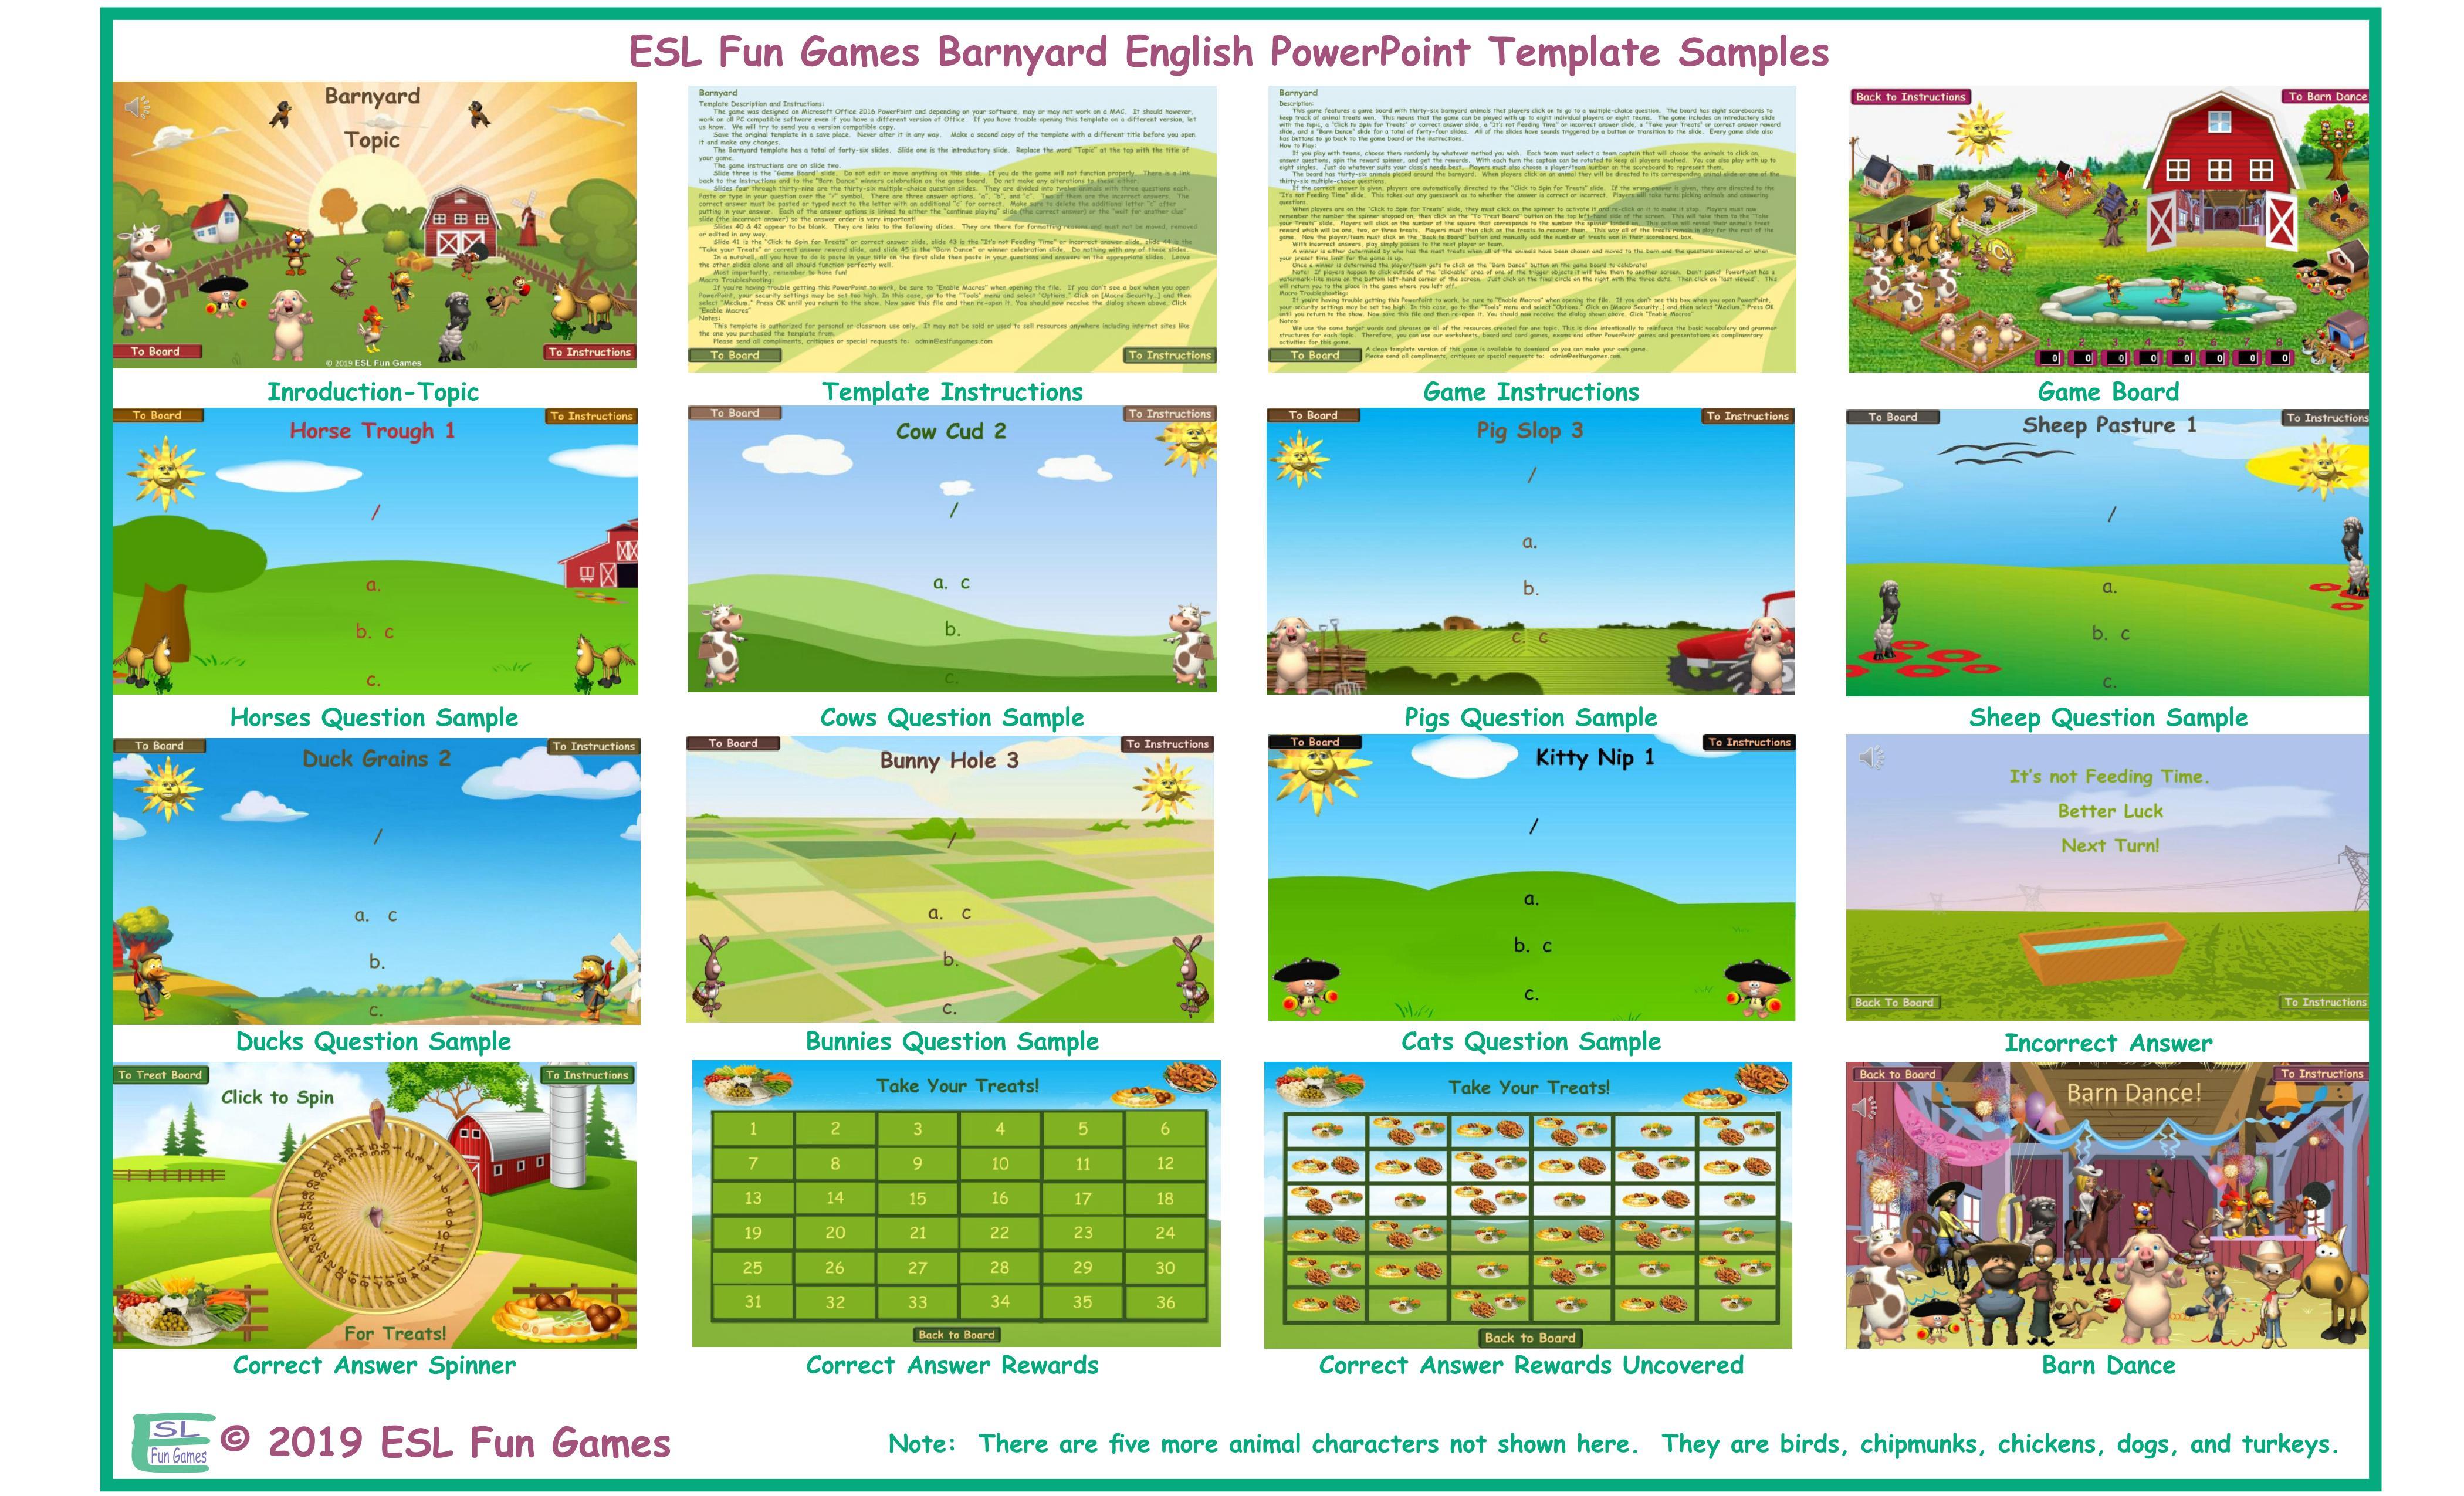 Barnyard English Powerpoint Game Template An Original By Esl Fun Games